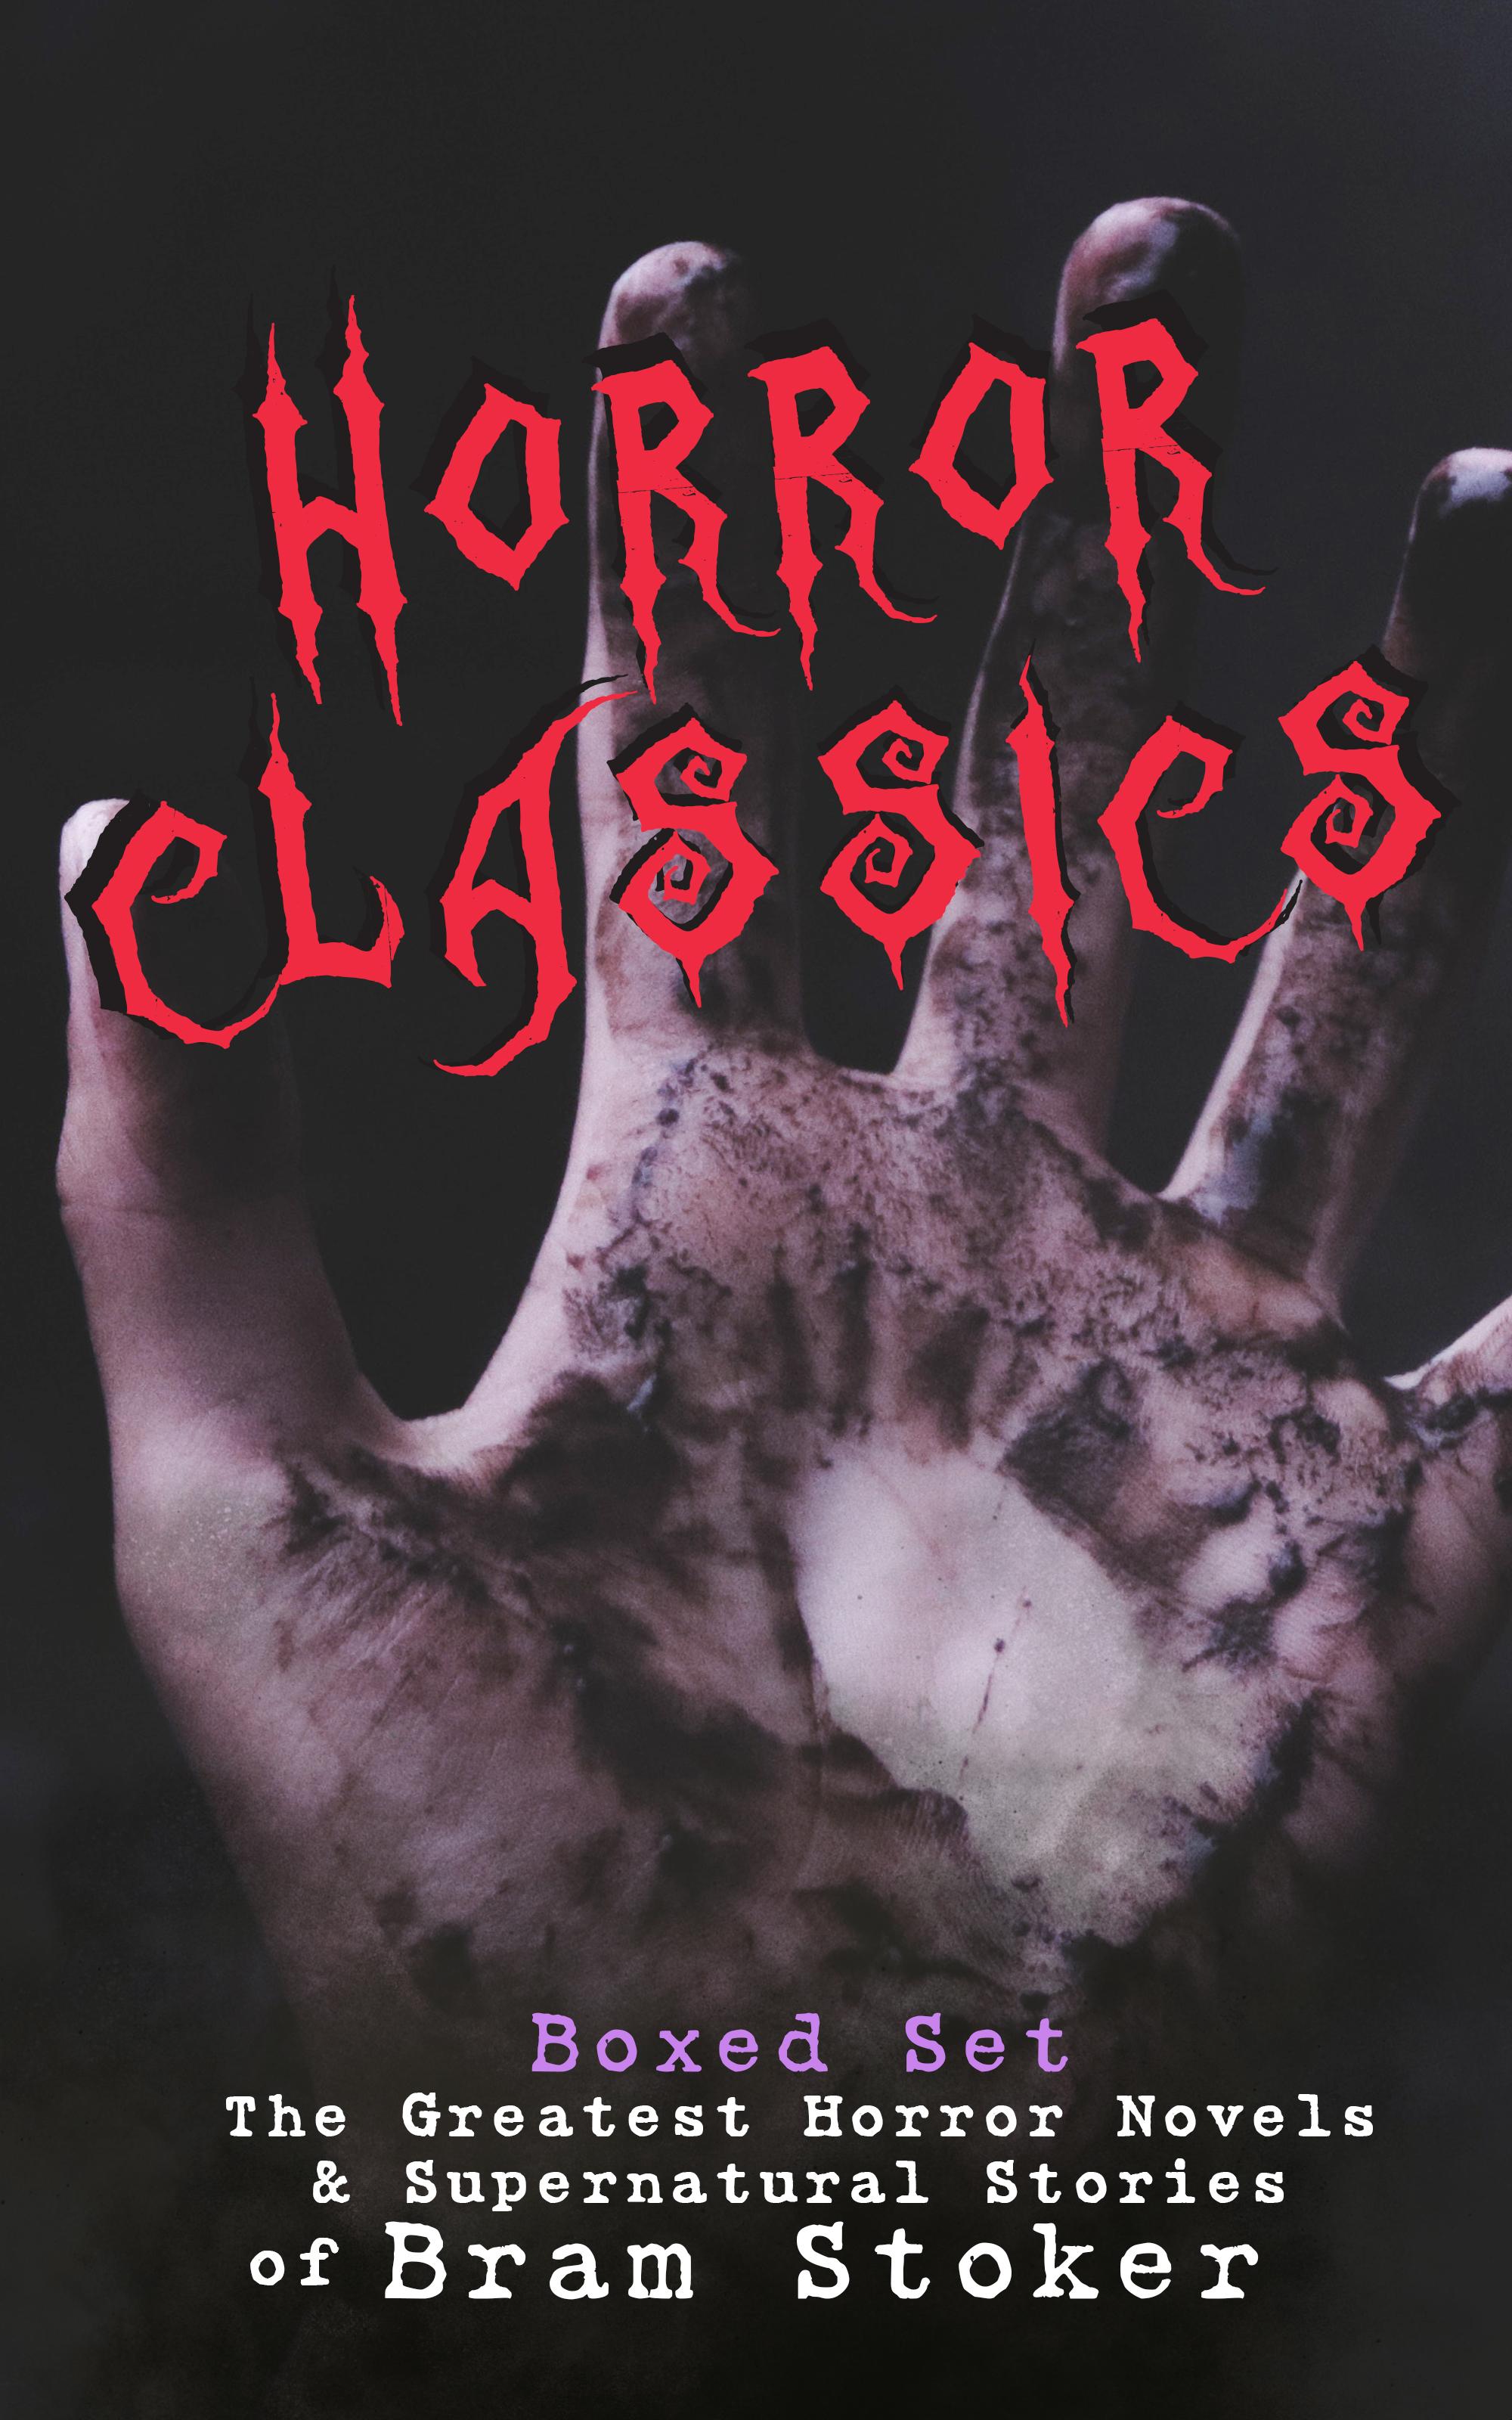 HORROR CLASSICS - Boxed Set: The Greatest Horror Novels & Supernatural Stories of Bram Stoker фото